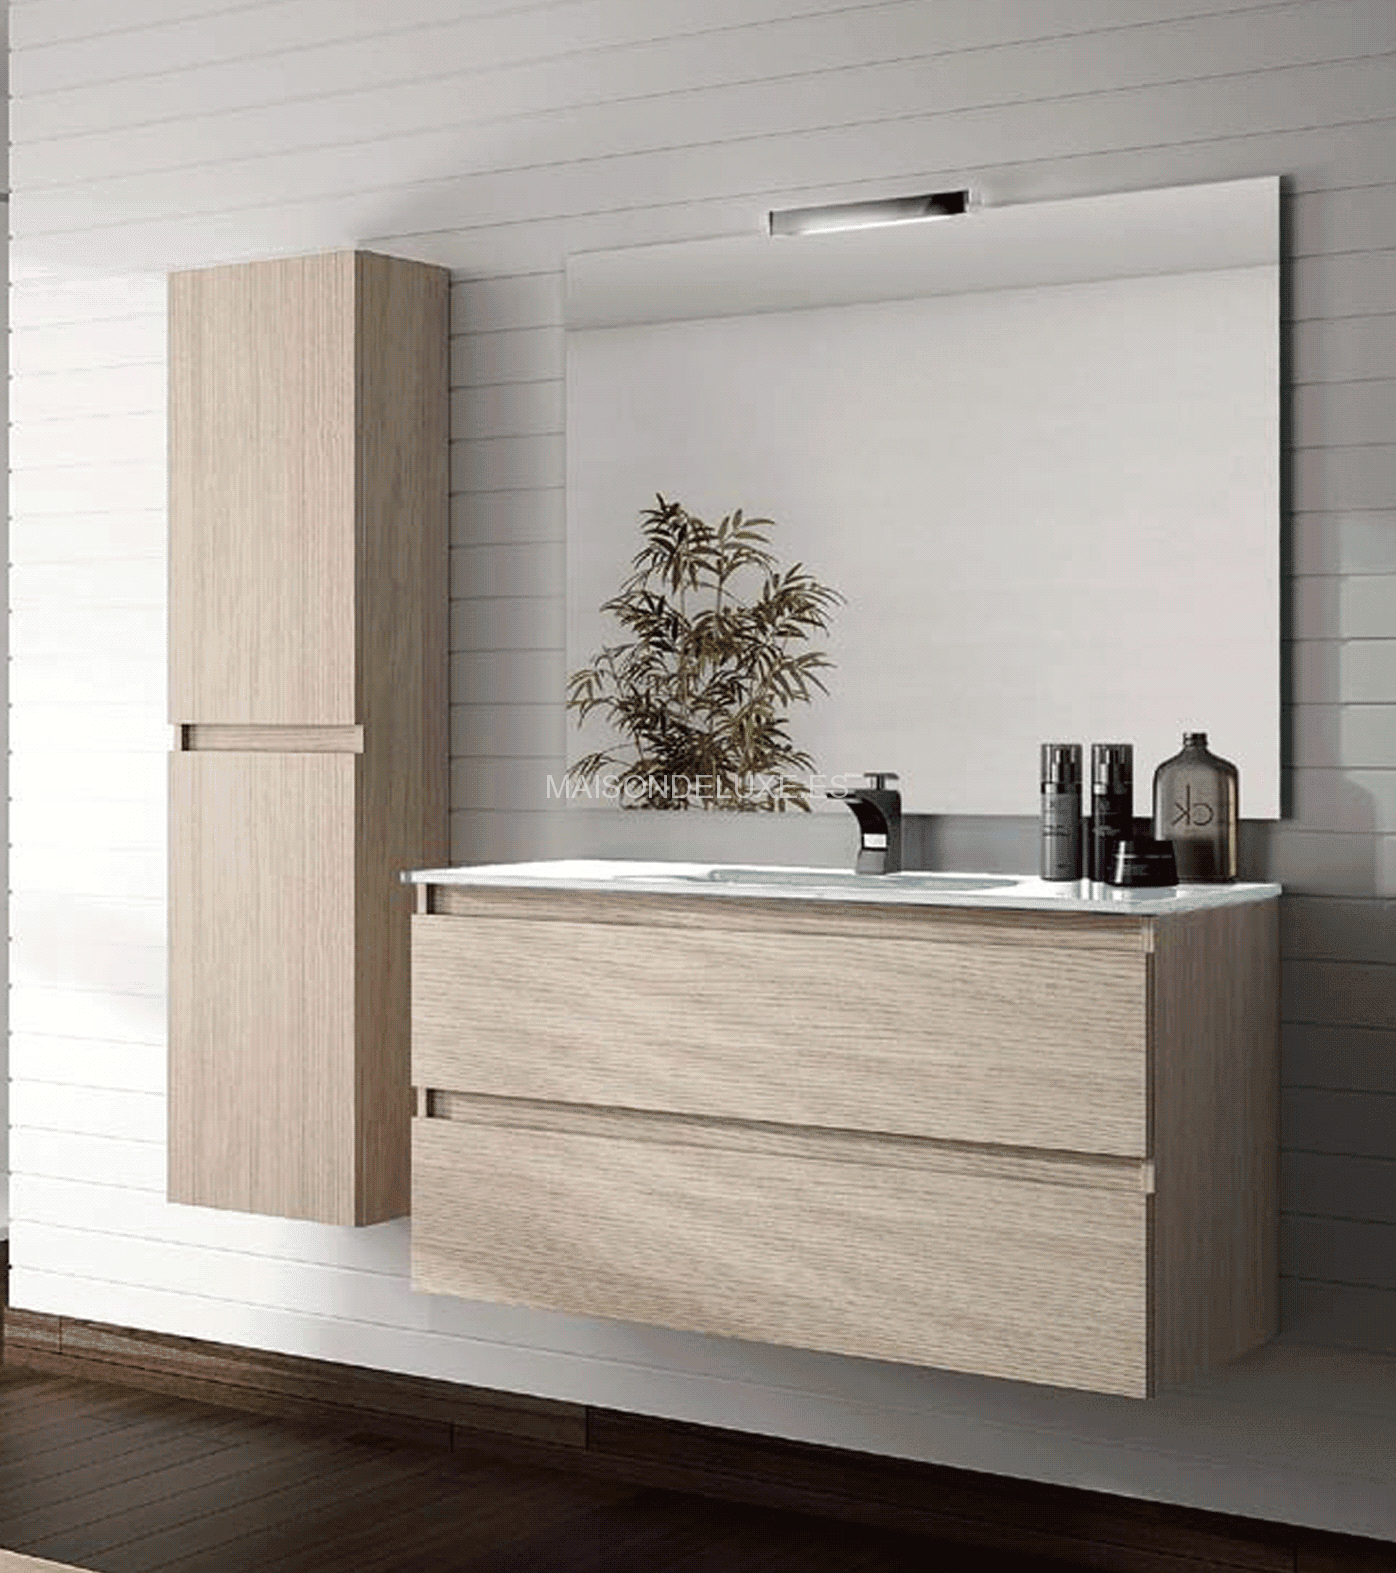 Mueble de lavabo obtenga ideas dise o de muebles para su for Muebles lavabo aki